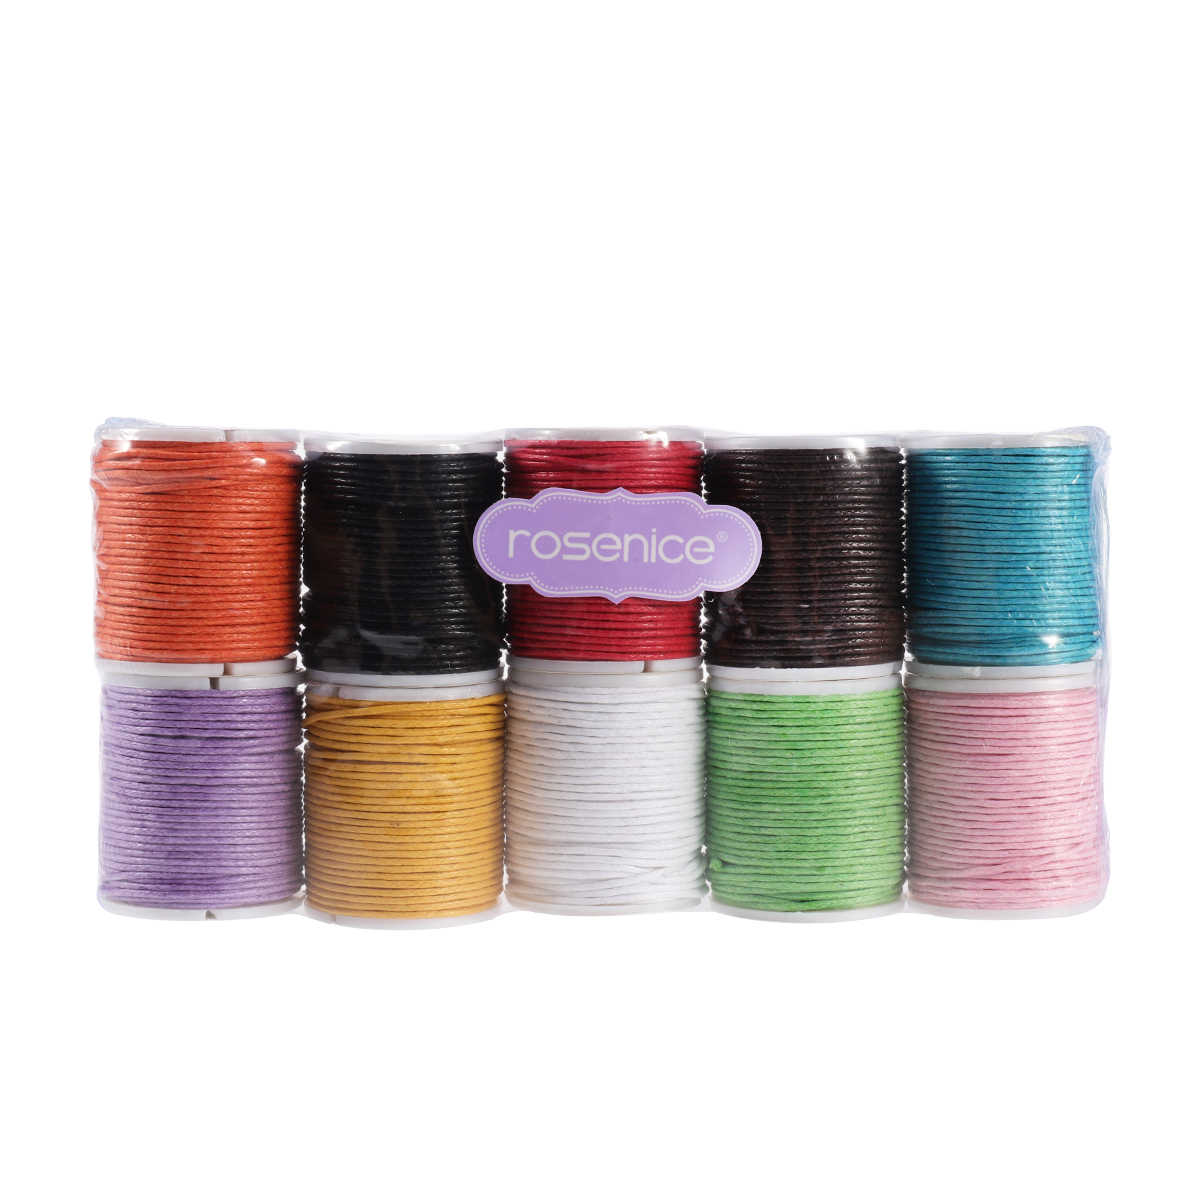 ROSENICE Strings Ropes Cords 10 Colors 10M 0.5mm for DIY Necklace Bracelet Craft Making